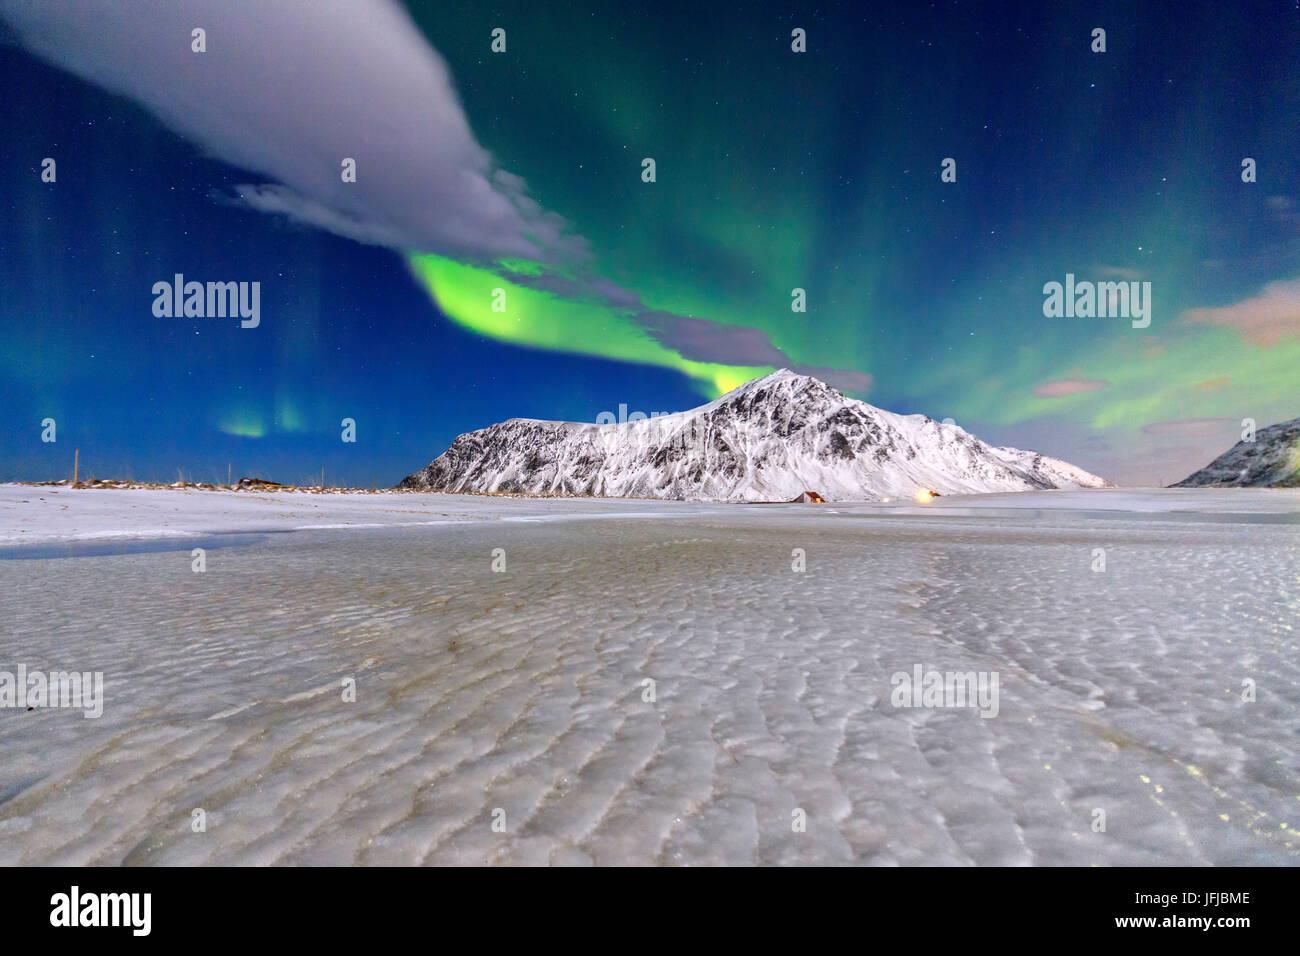 Northern Lights illuminate the sky and the snowy peaks, Flakstad, Lofoten Islands Northern Norway Europe - Stock Image